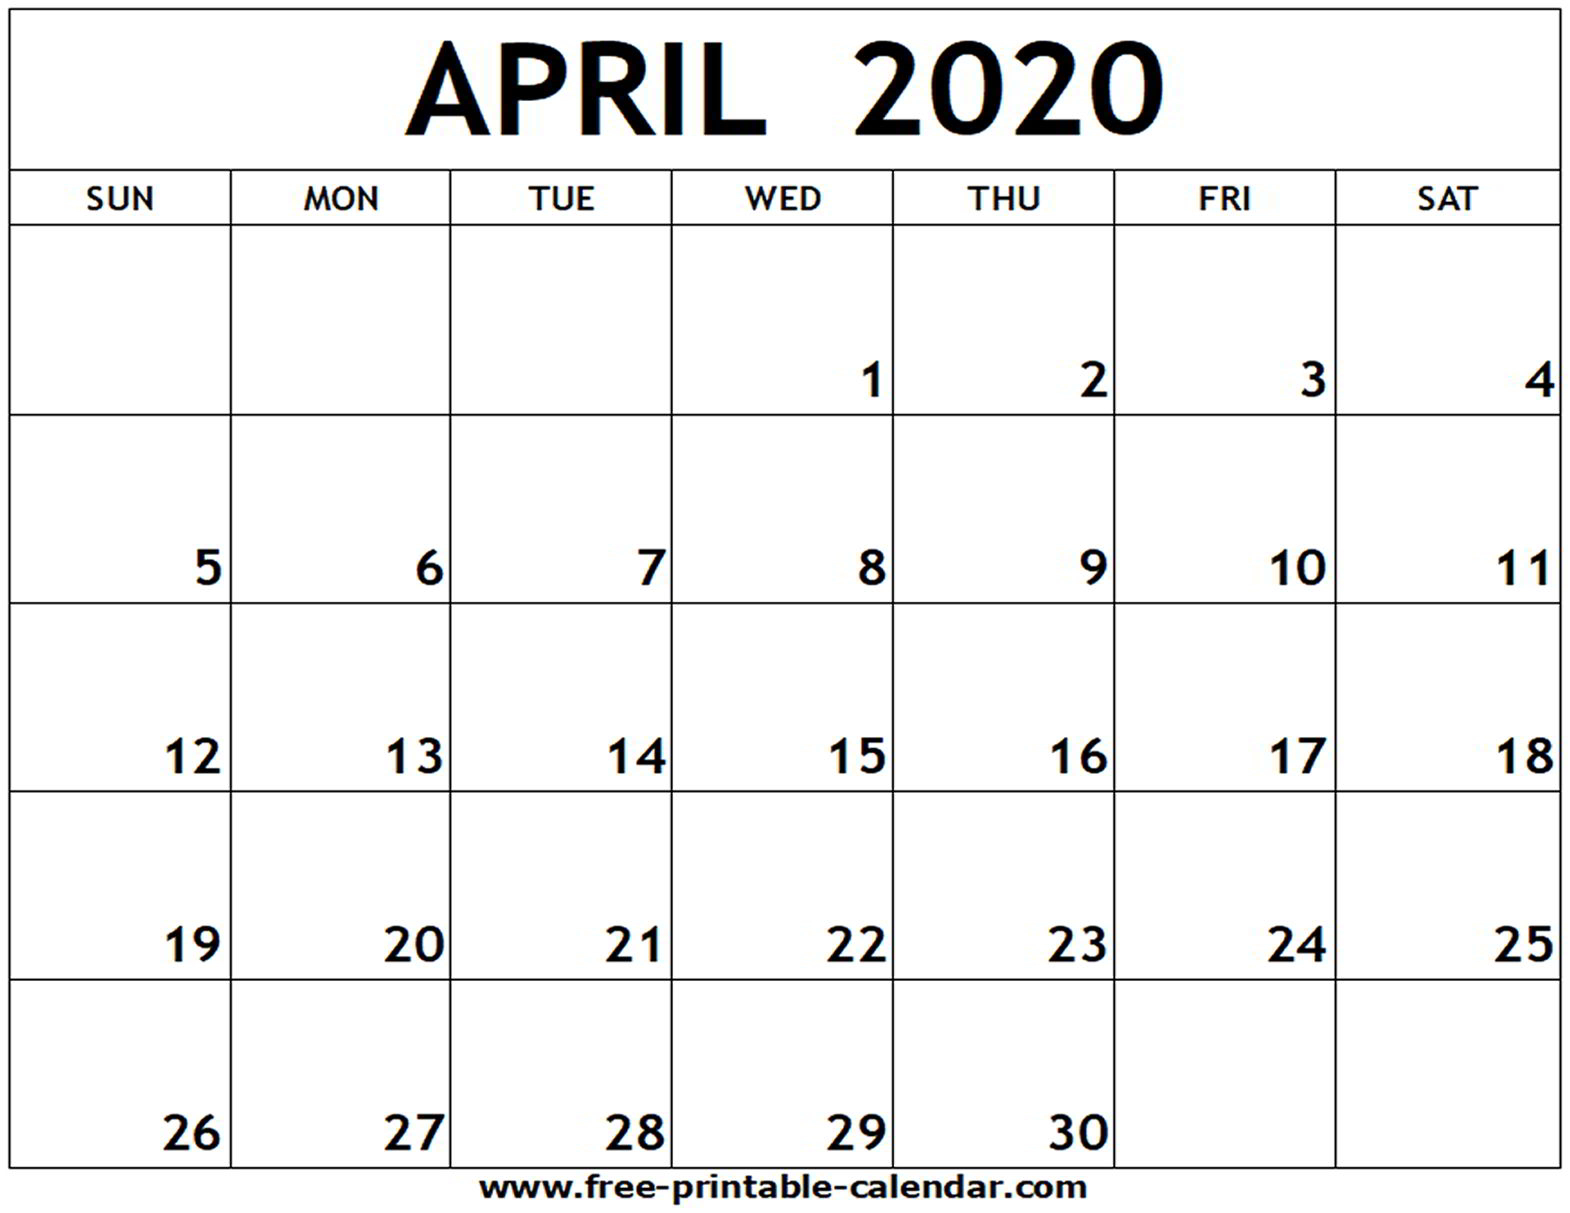 Printable Calendars April 2020  Bolan.horizonconsulting.co within April 2020 Printable Calendar